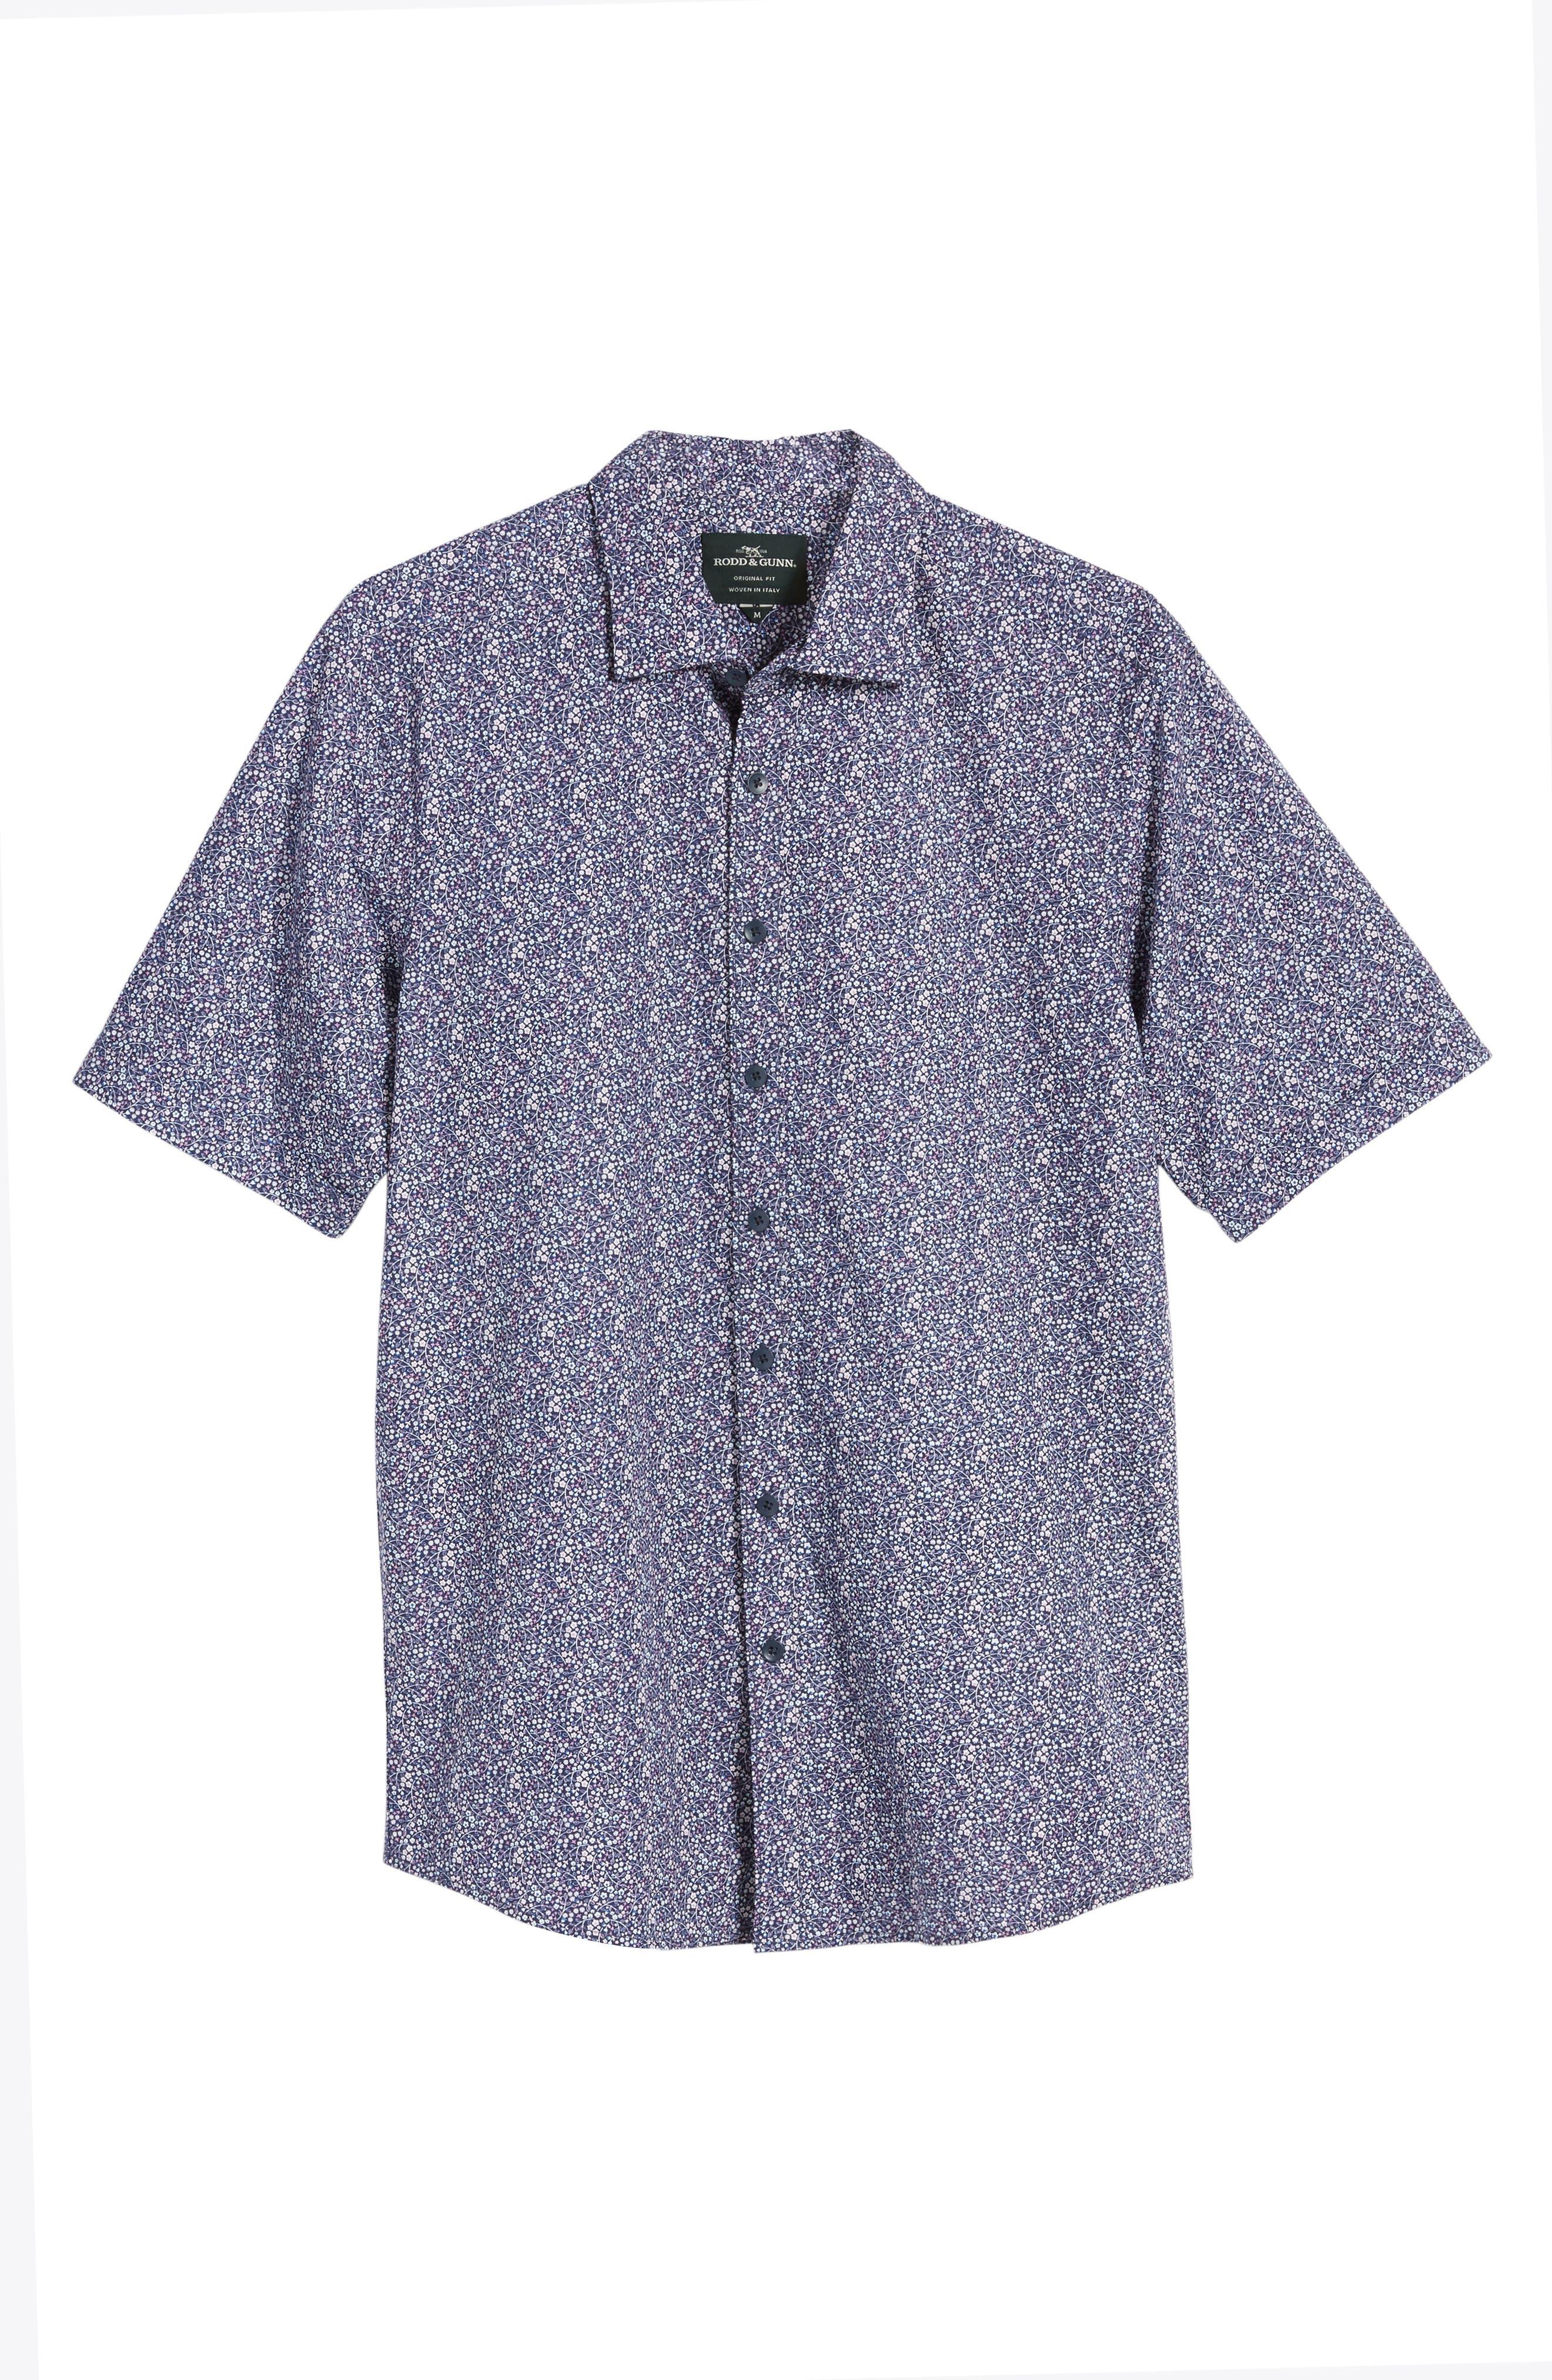 Lorneville Original Fit Sport Shirt,                             Alternate thumbnail 6, color,                             423